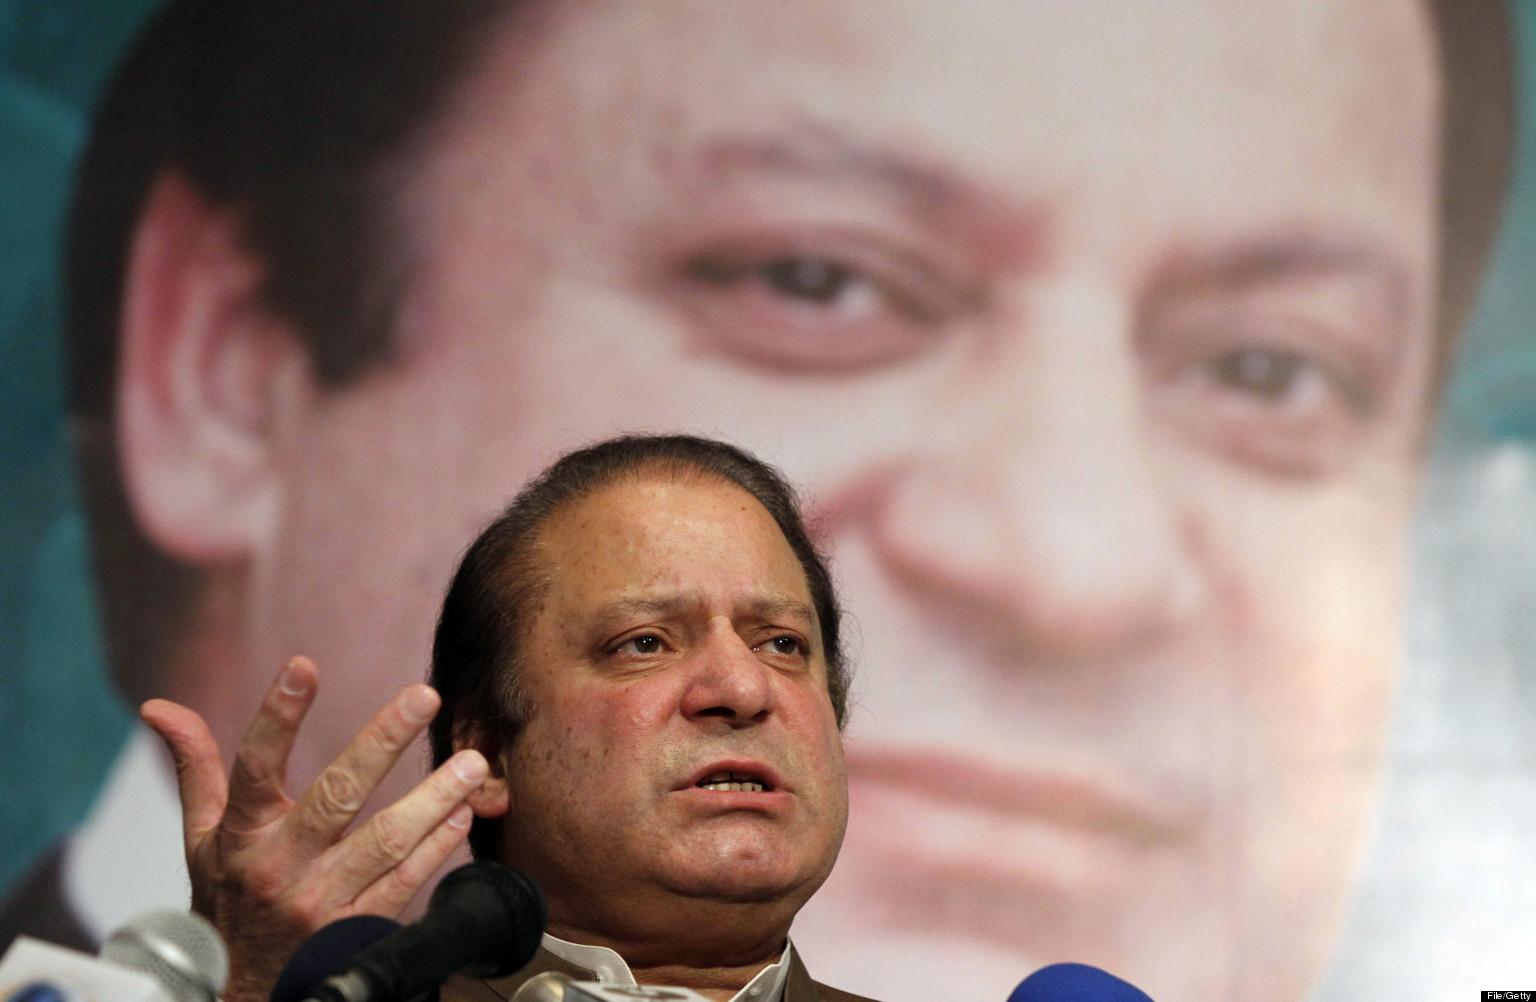 Nawaz Sharif, Pakistan Prime Minister, Elected For Third Term